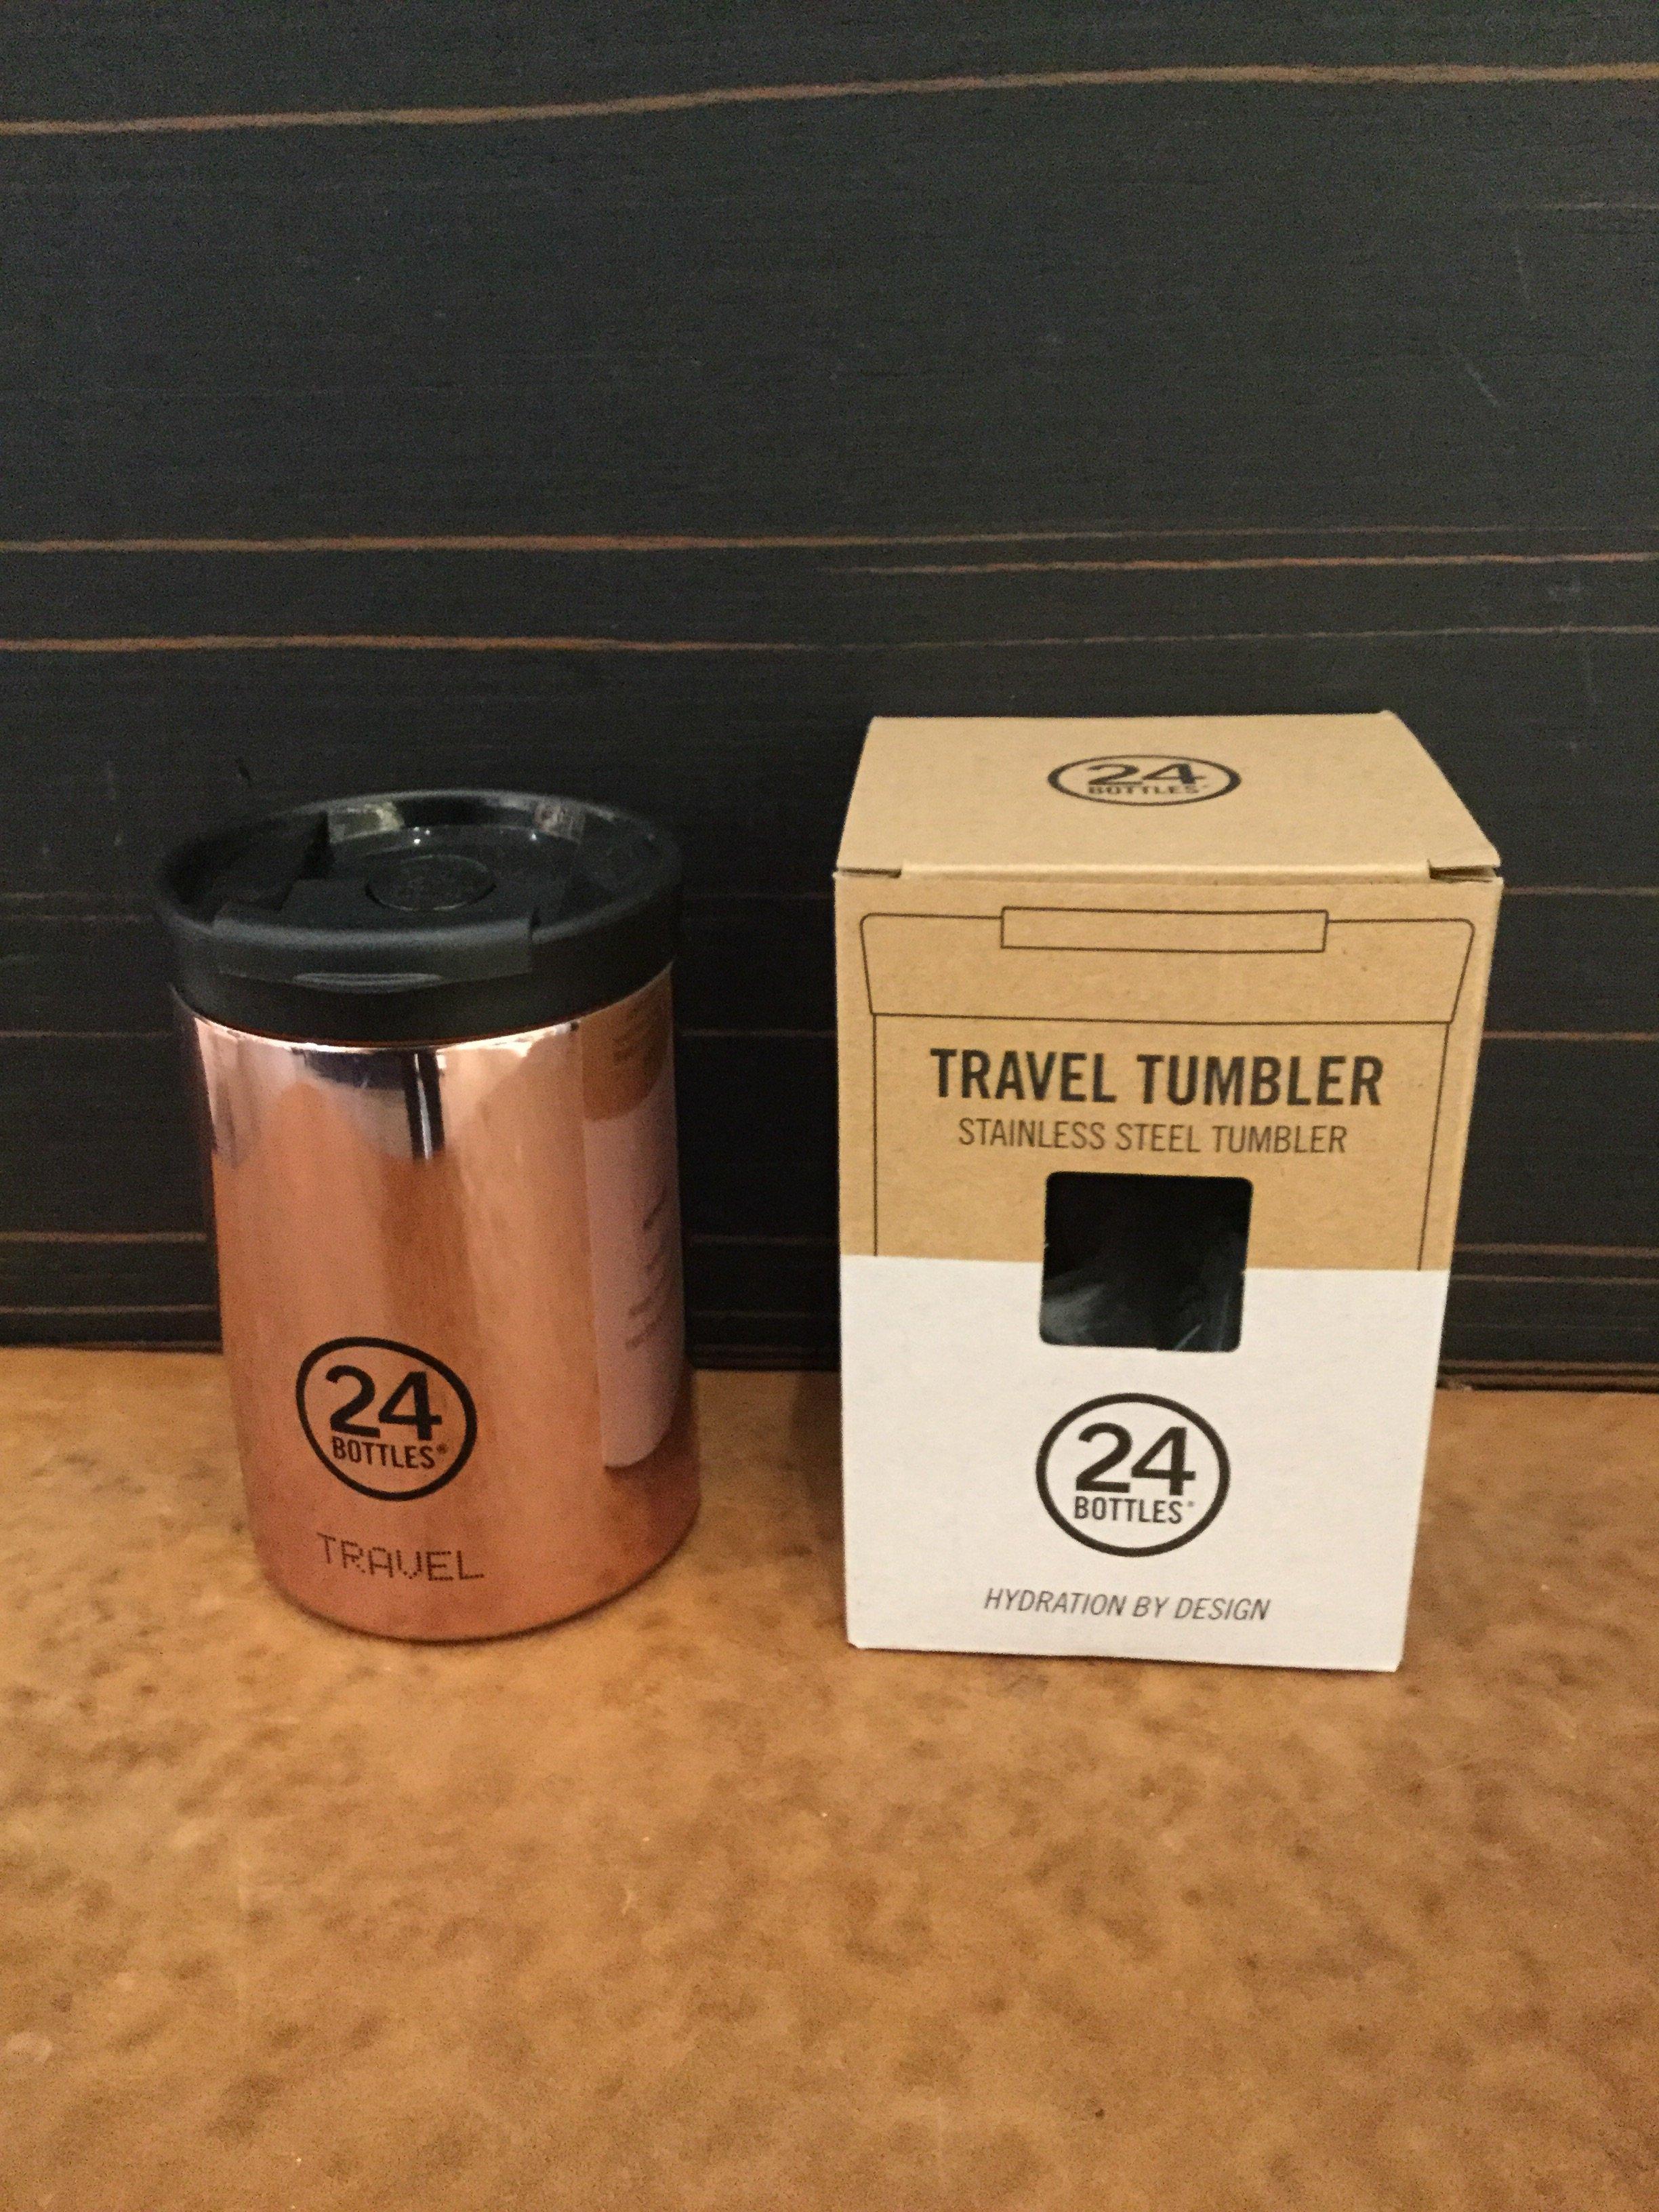 24 bottles travle